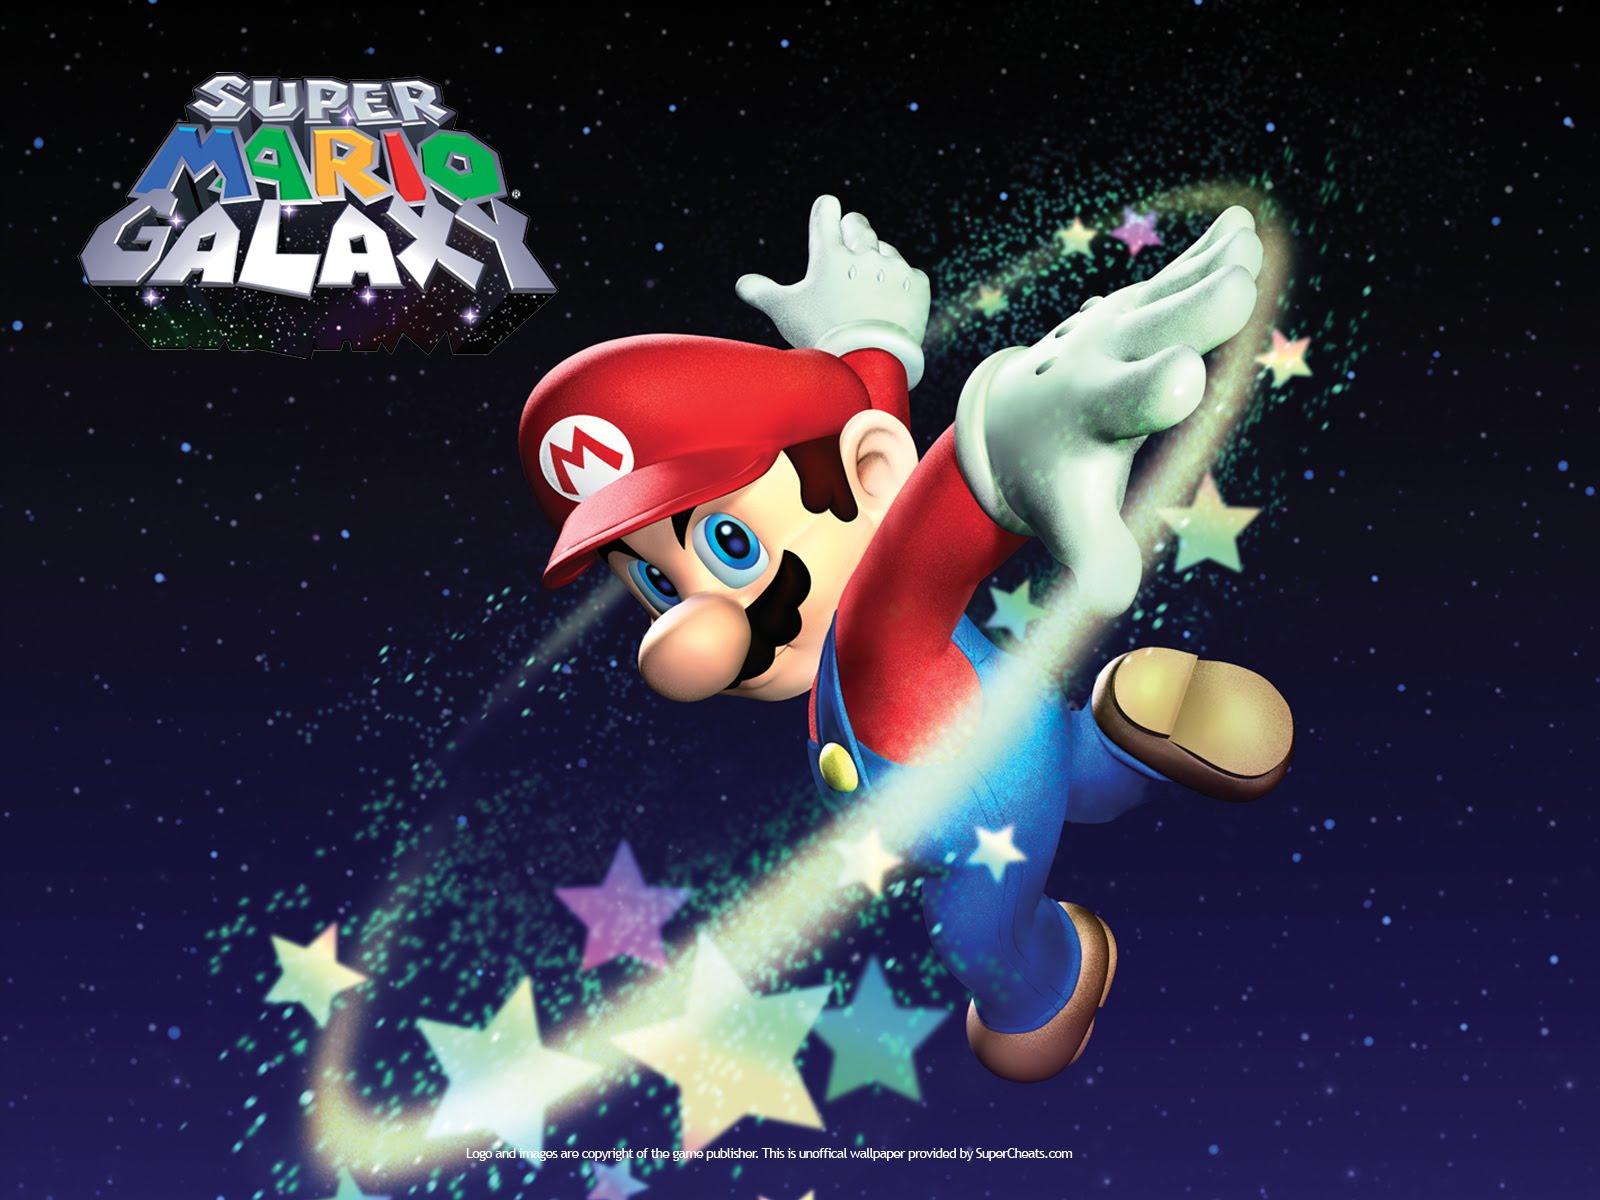 Super Mario Galaxy Wallpapers: Trololo Blogg: Wallpapers 3d Galaxy S